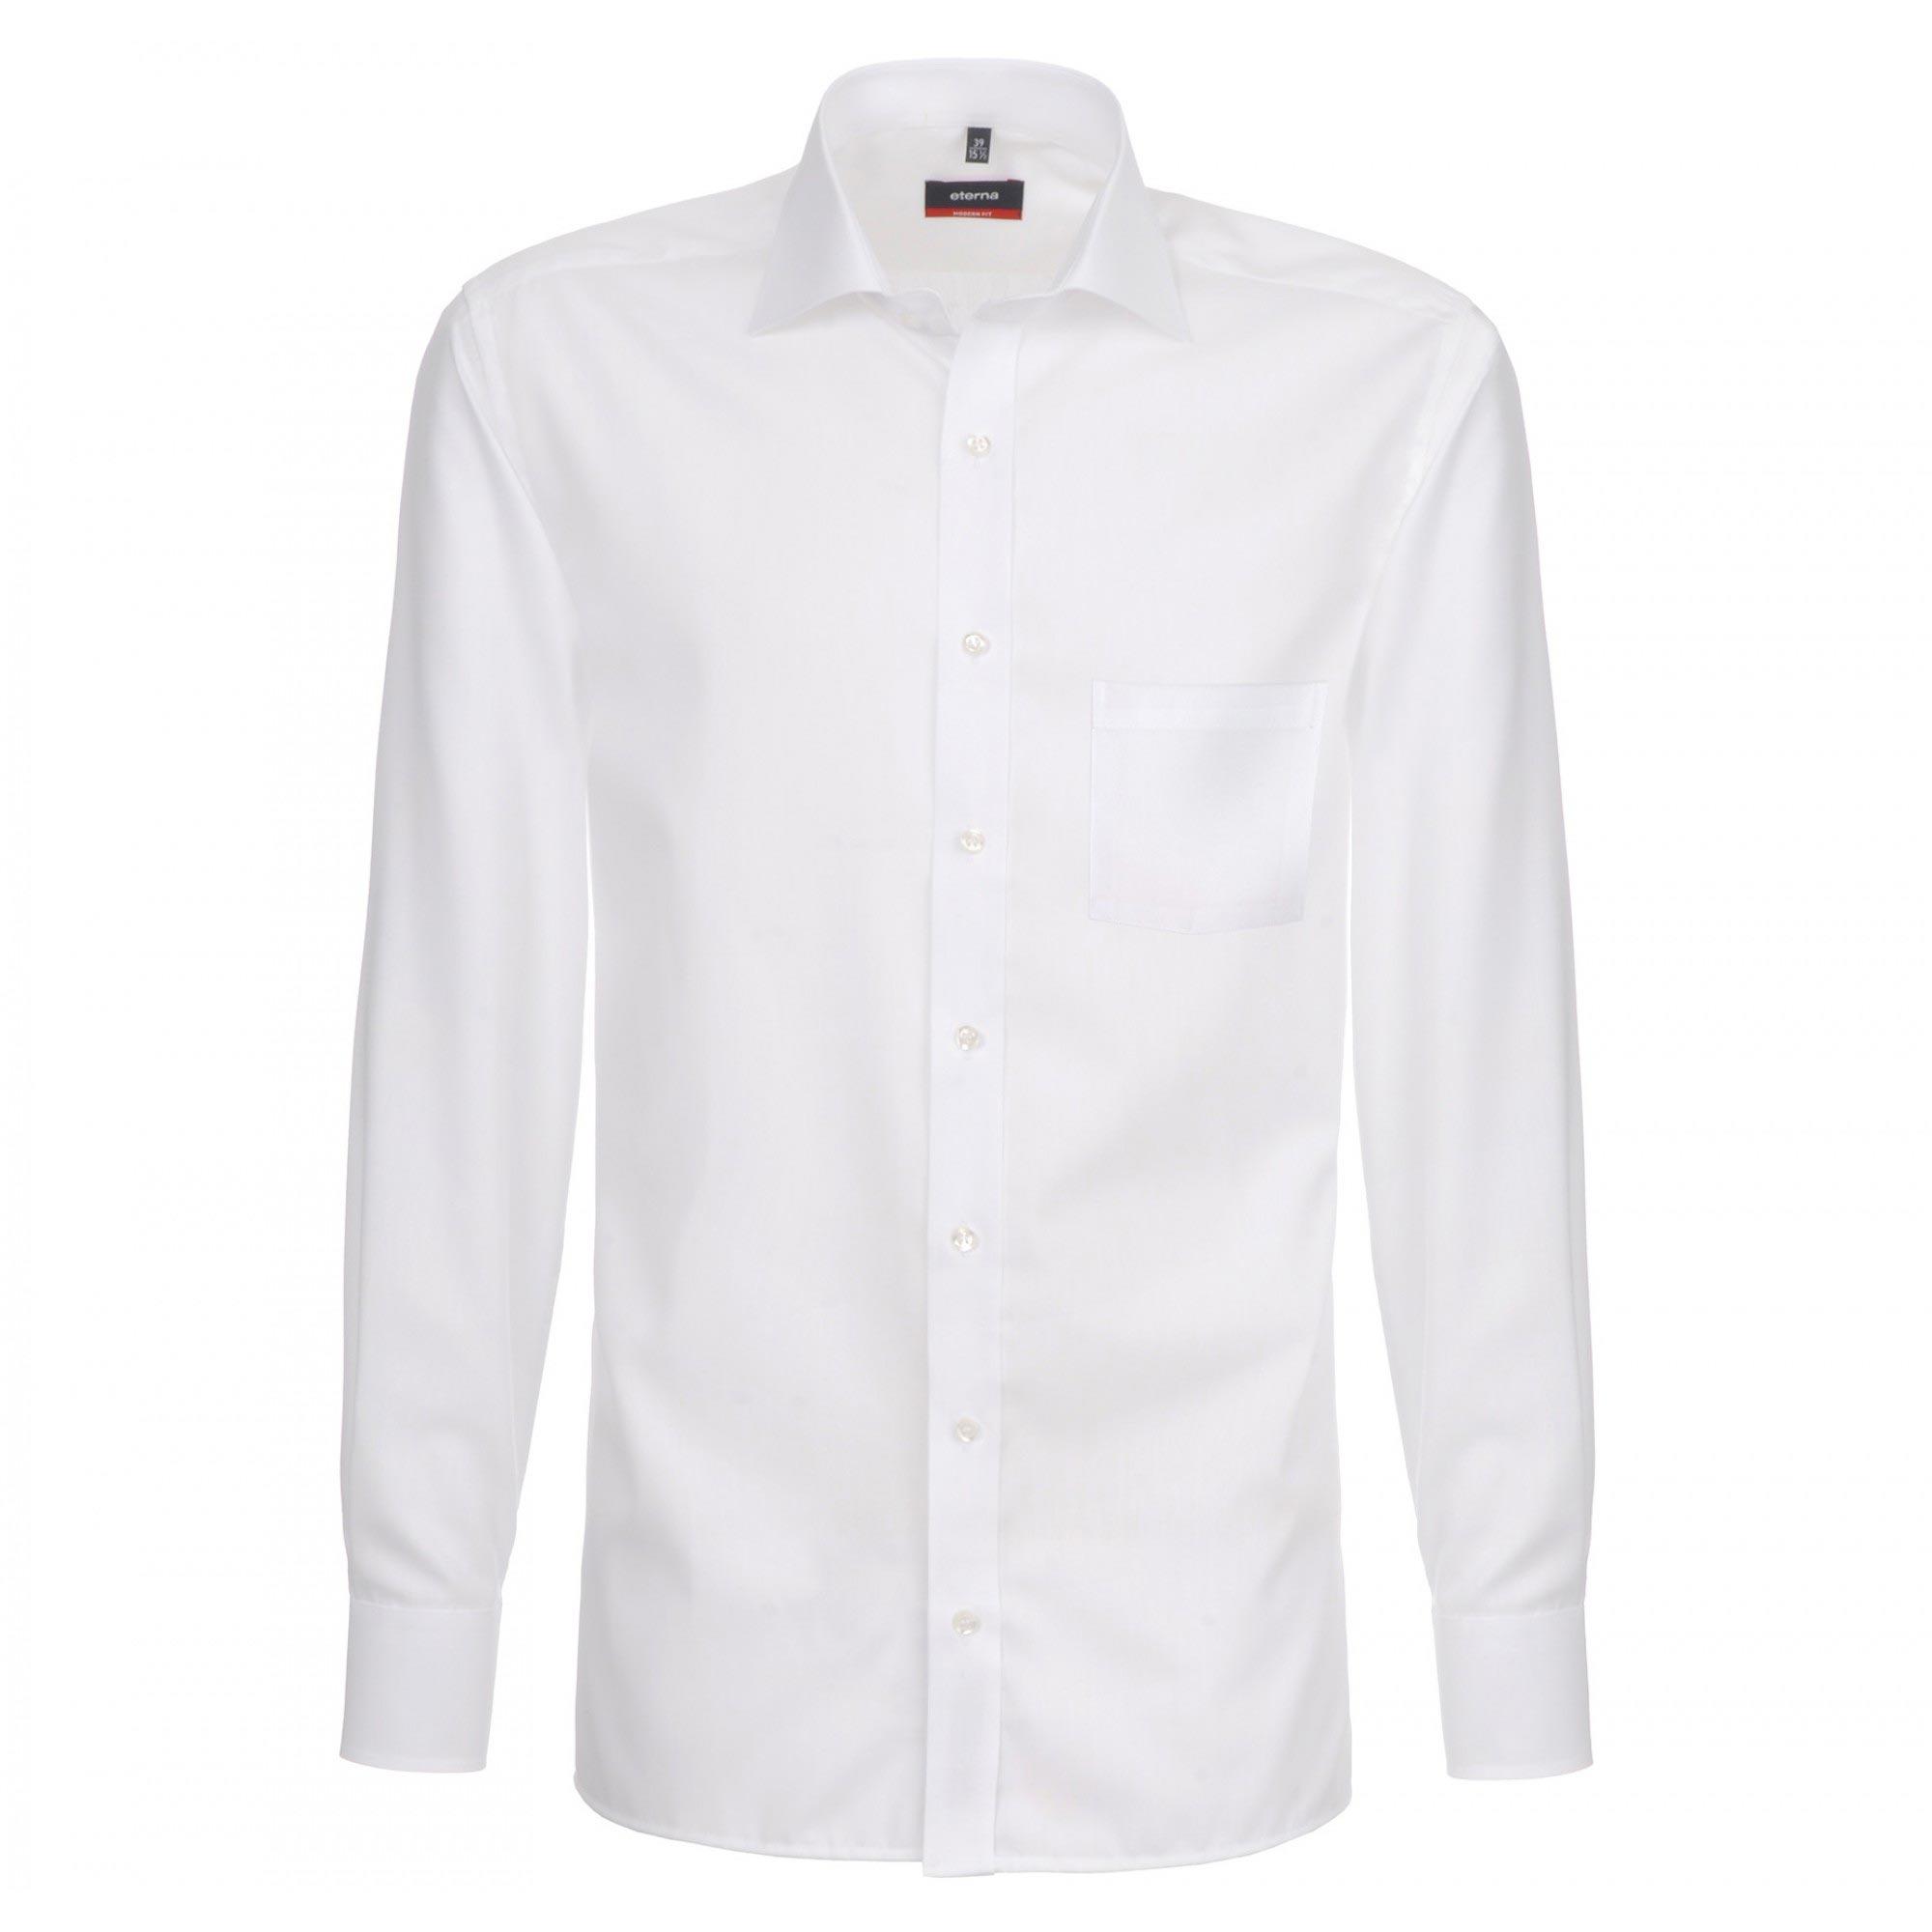 80274b287cb Мужская прямая рубашка (Modern Fit) белая с длинным рукавом 02-1100 ...